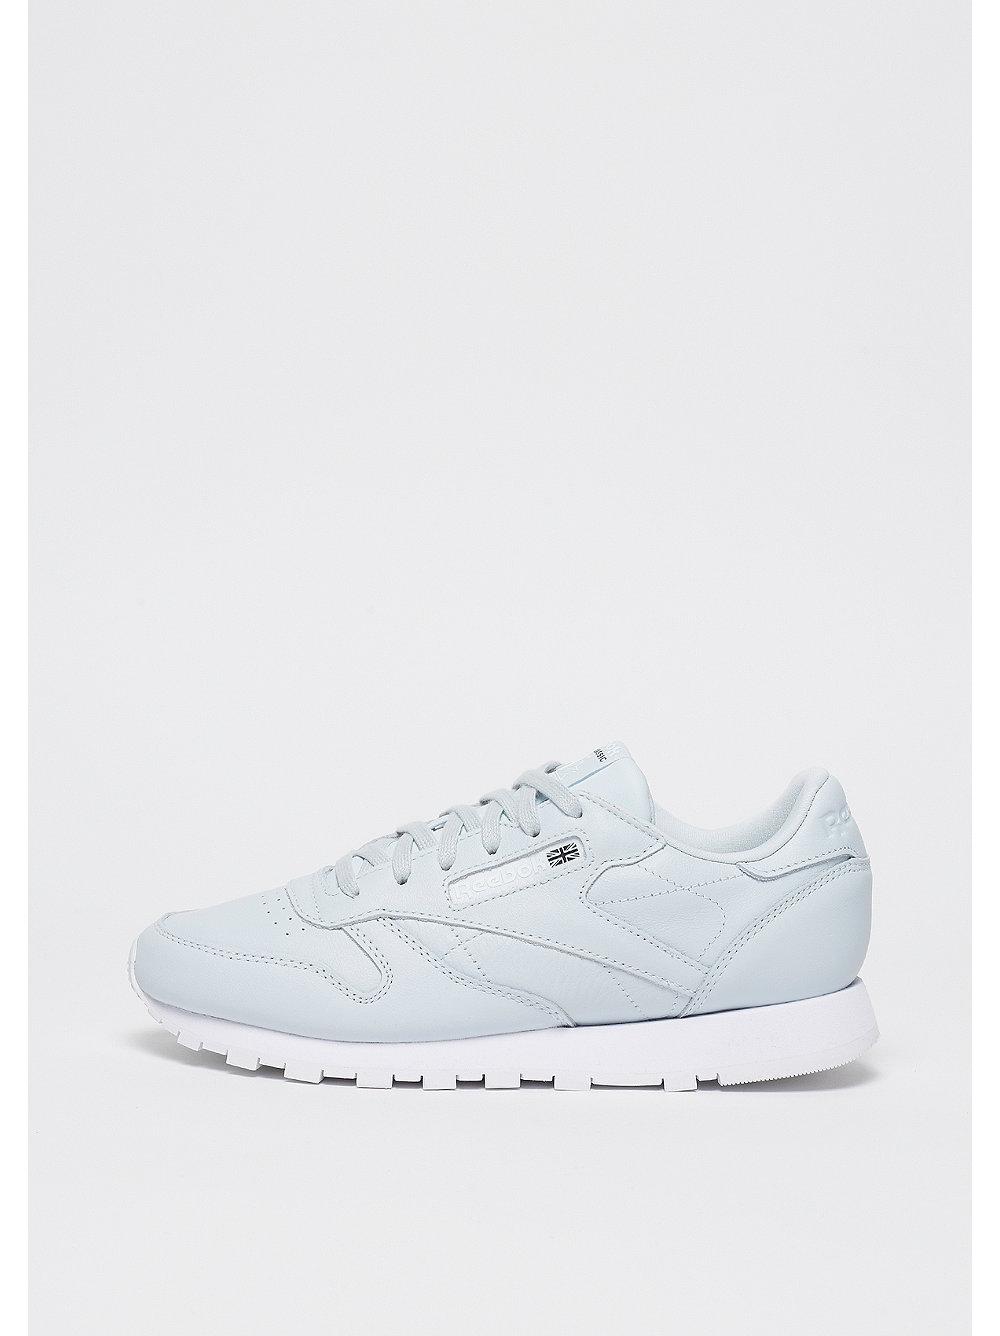 Classic Leather X Face Sneaker von Reebok bei SNIPES e9d3151195dd